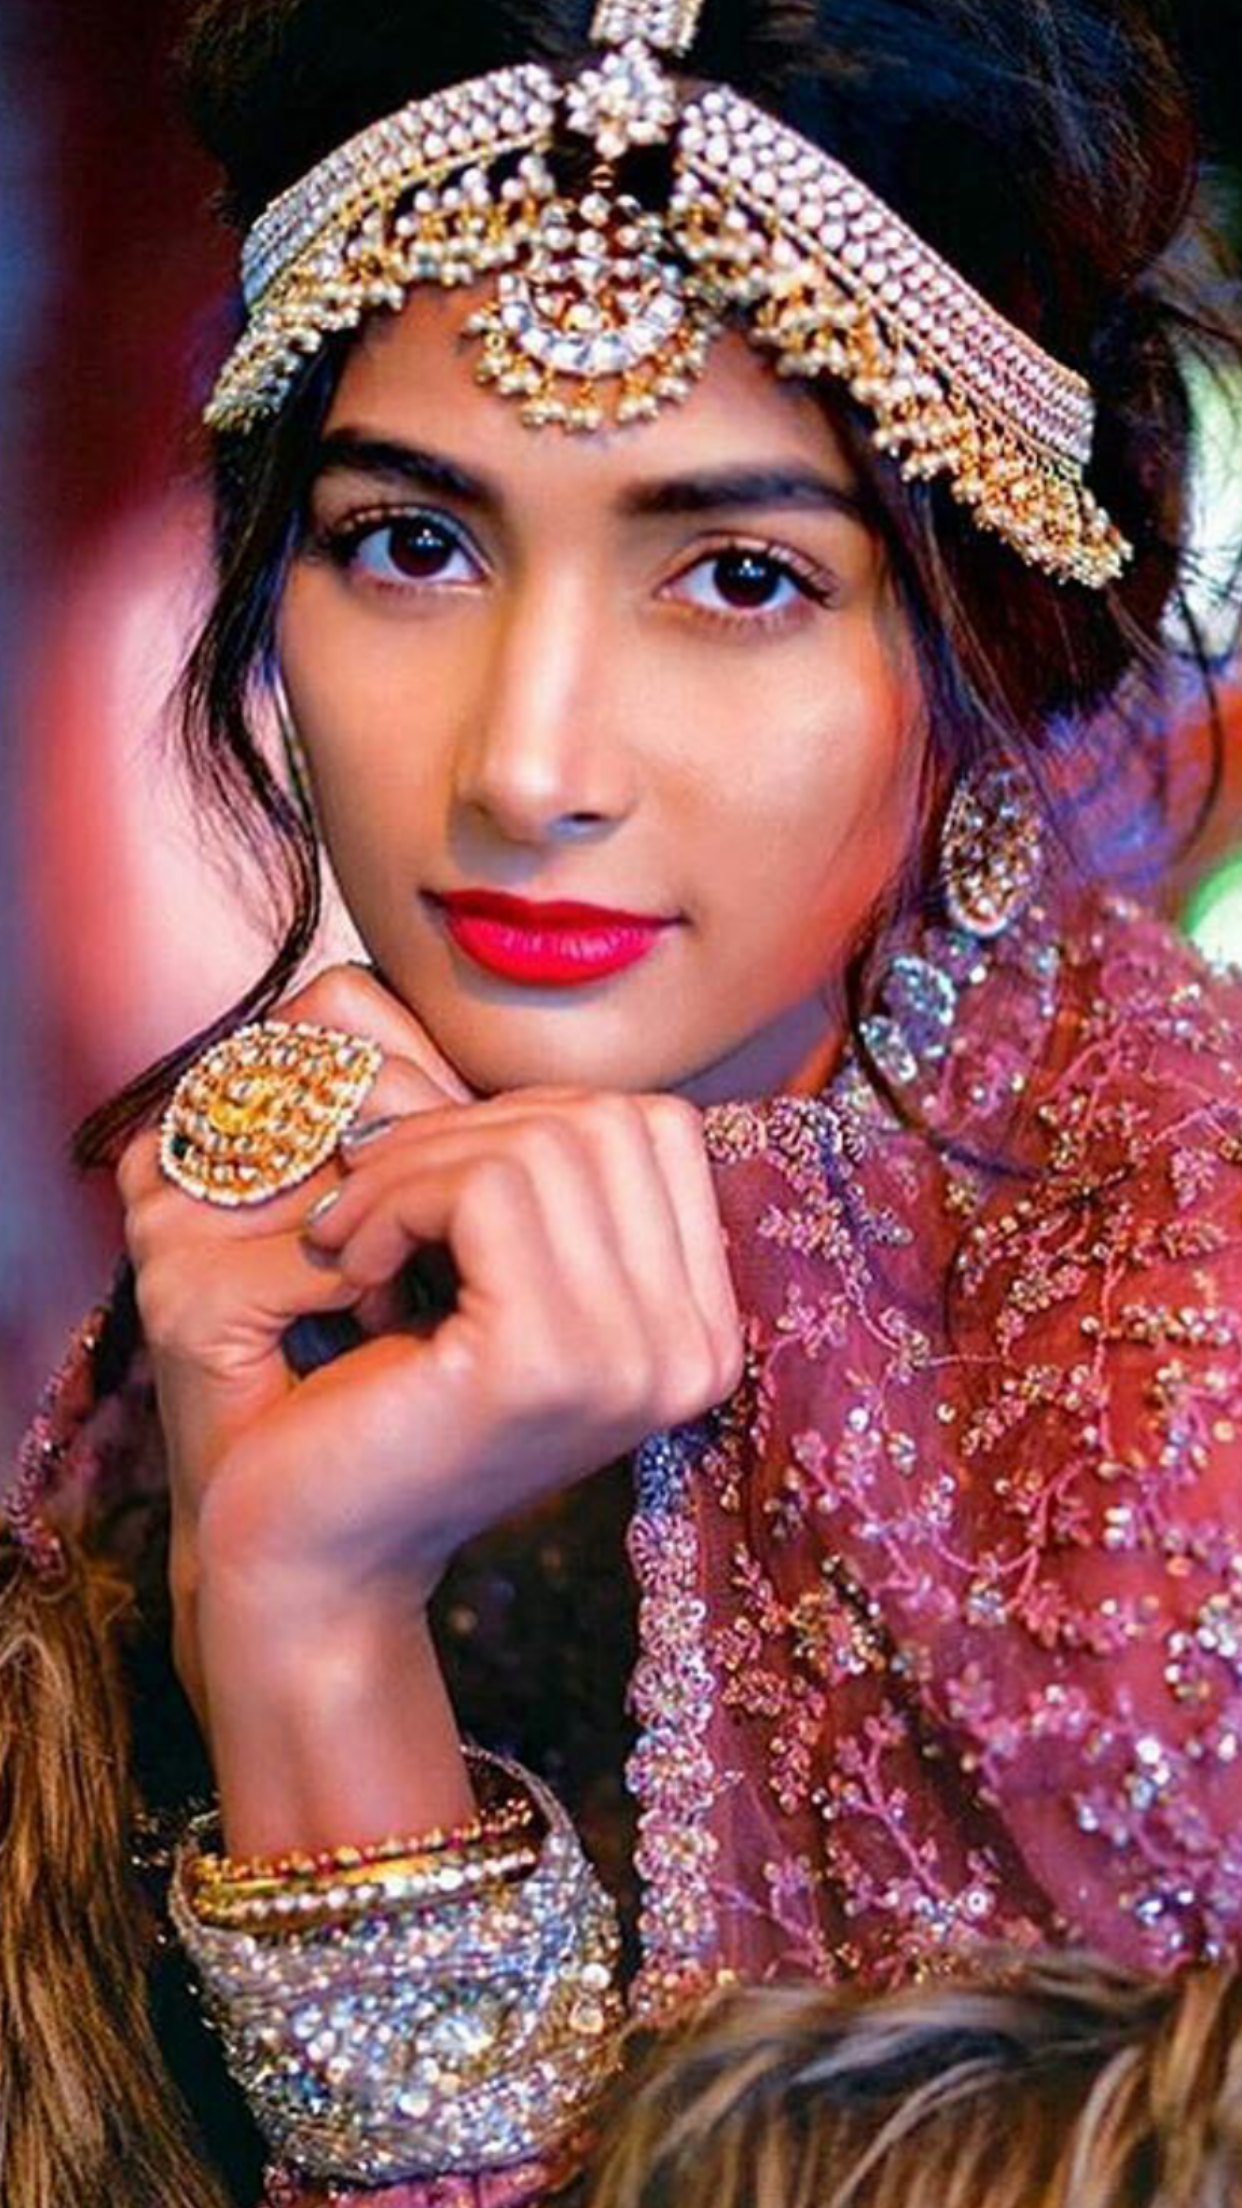 Pin de Maryam Ali en Fashion   Pinterest   Sonrisa y Mundo